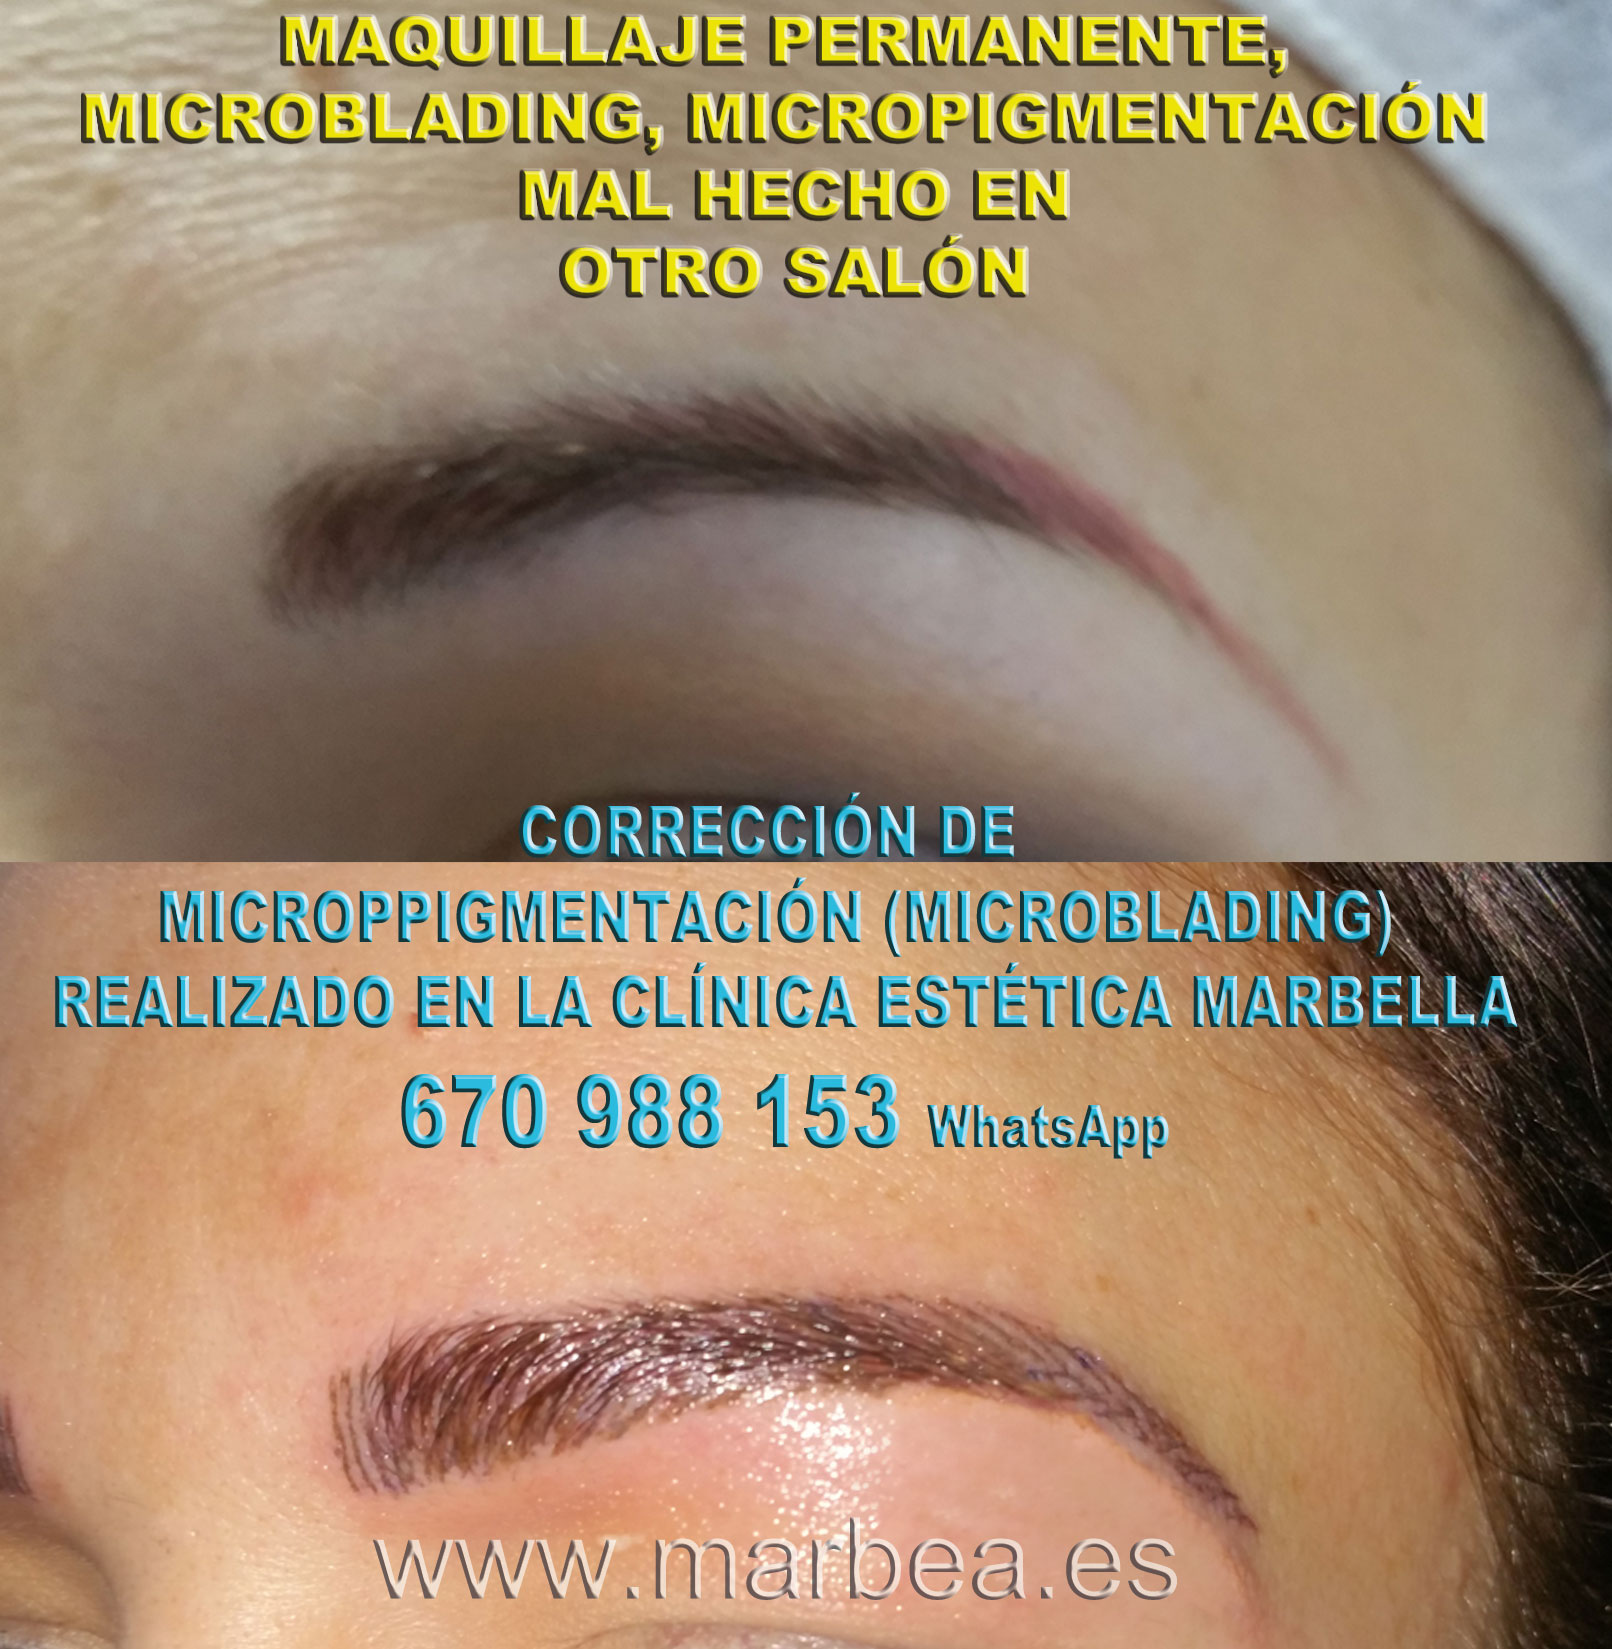 QUITAR TATUAJE CEJAS clínica estética micropigmentación ofrenda micropigmentacion correctiva de cejas,corregir micropigmentación mal hecha